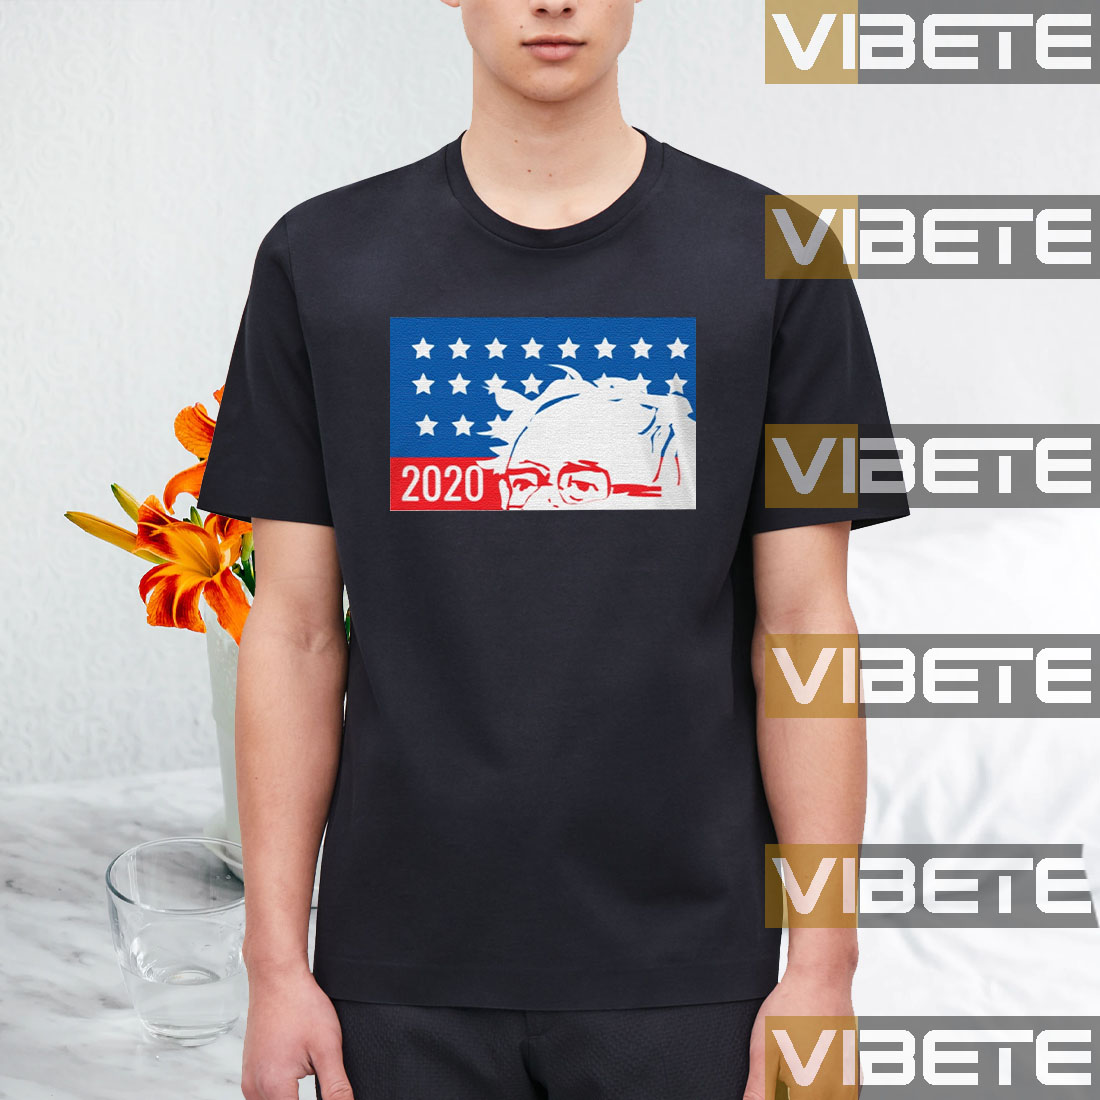 Bernie 2020 American T-Shirt